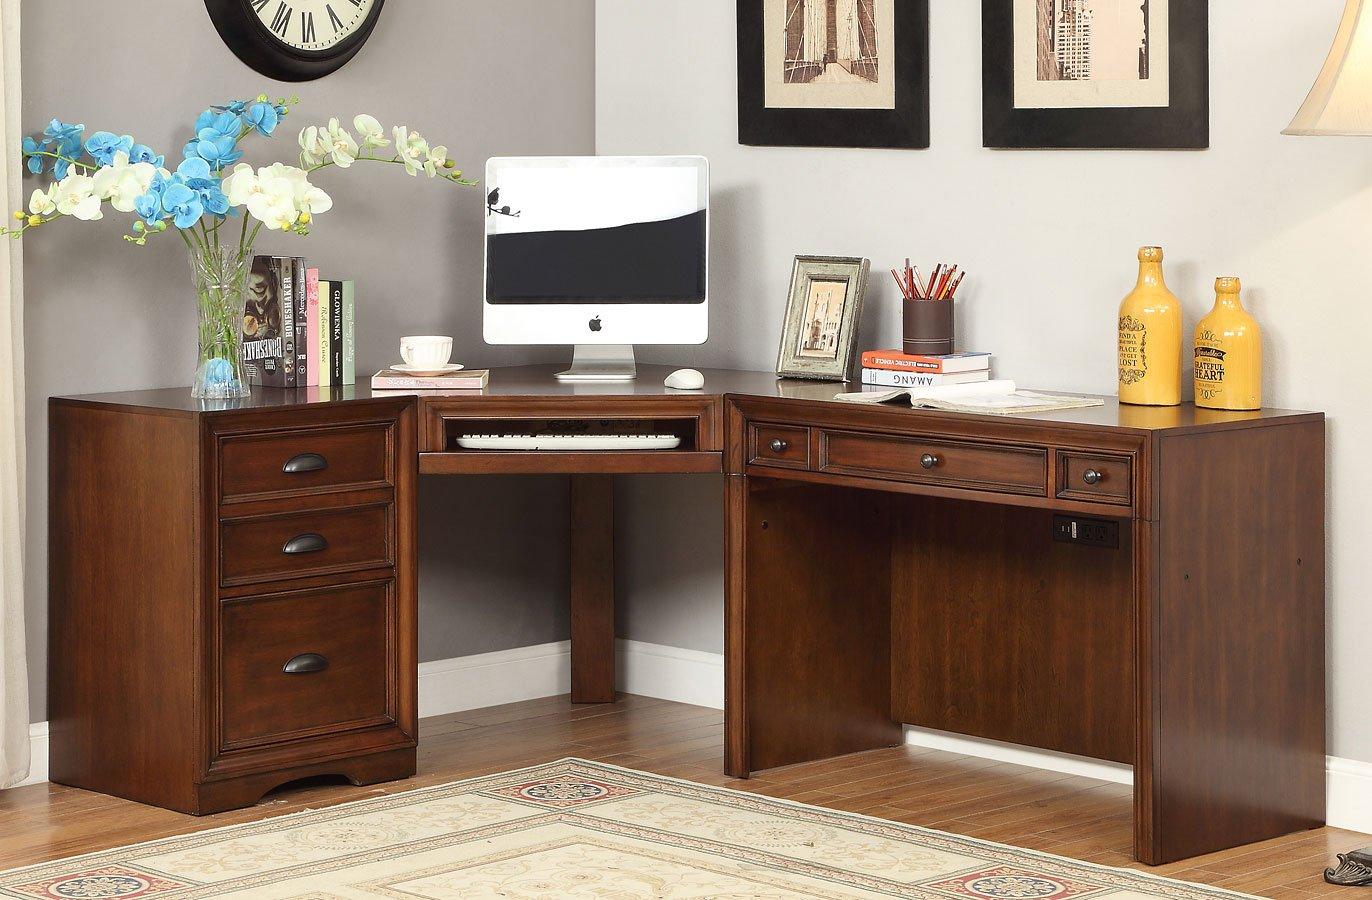 Napa Modular Corner Desk Parker House Furniture Cart